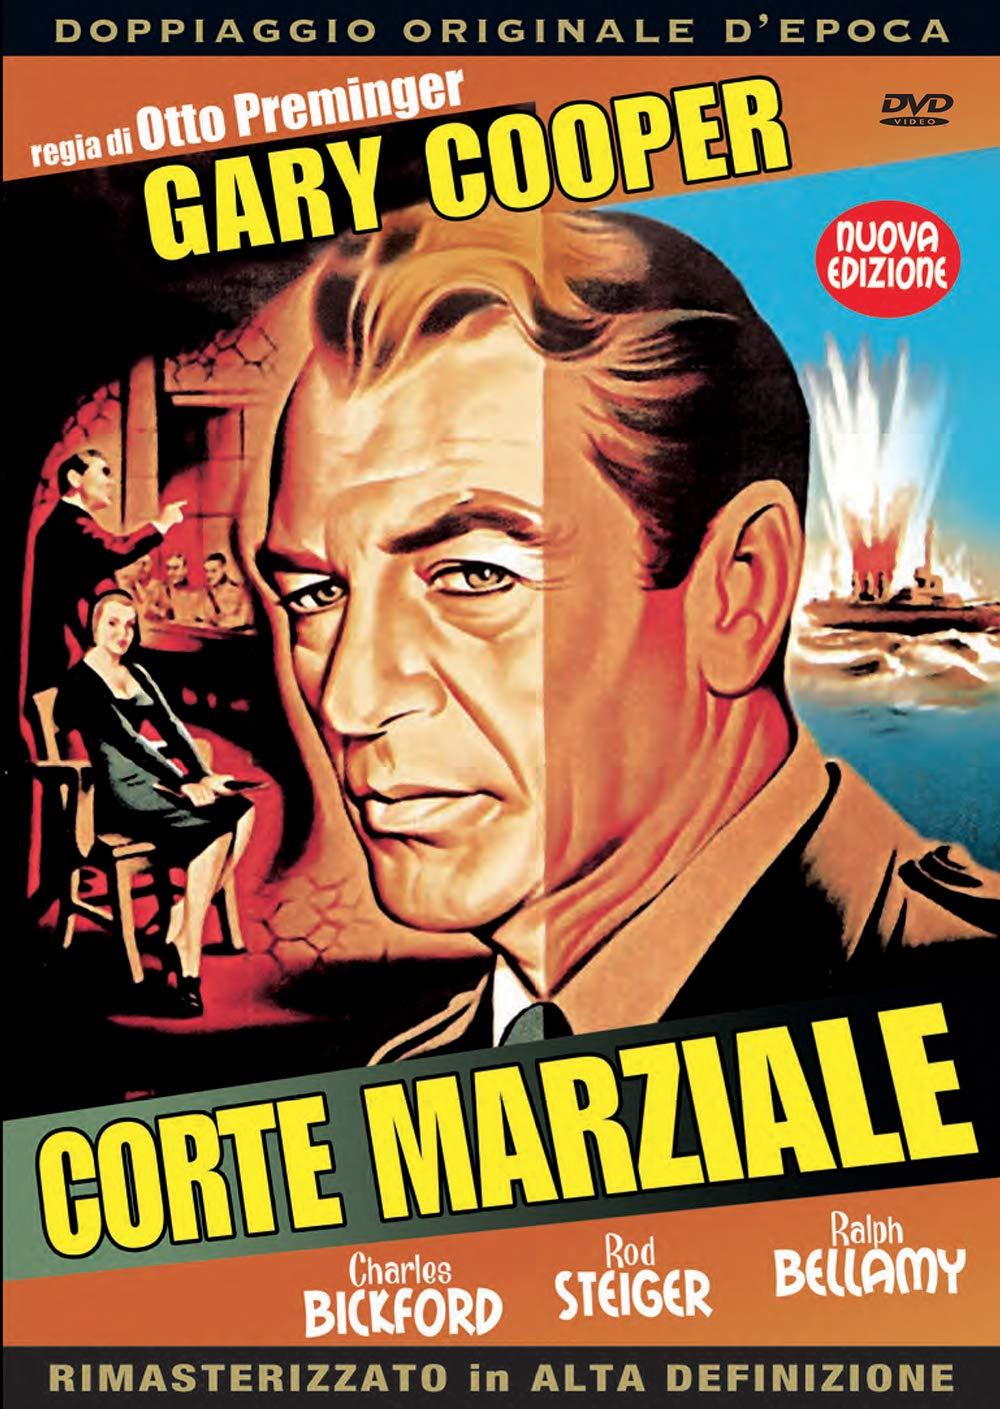 CORTE MARZIALE (DVD)